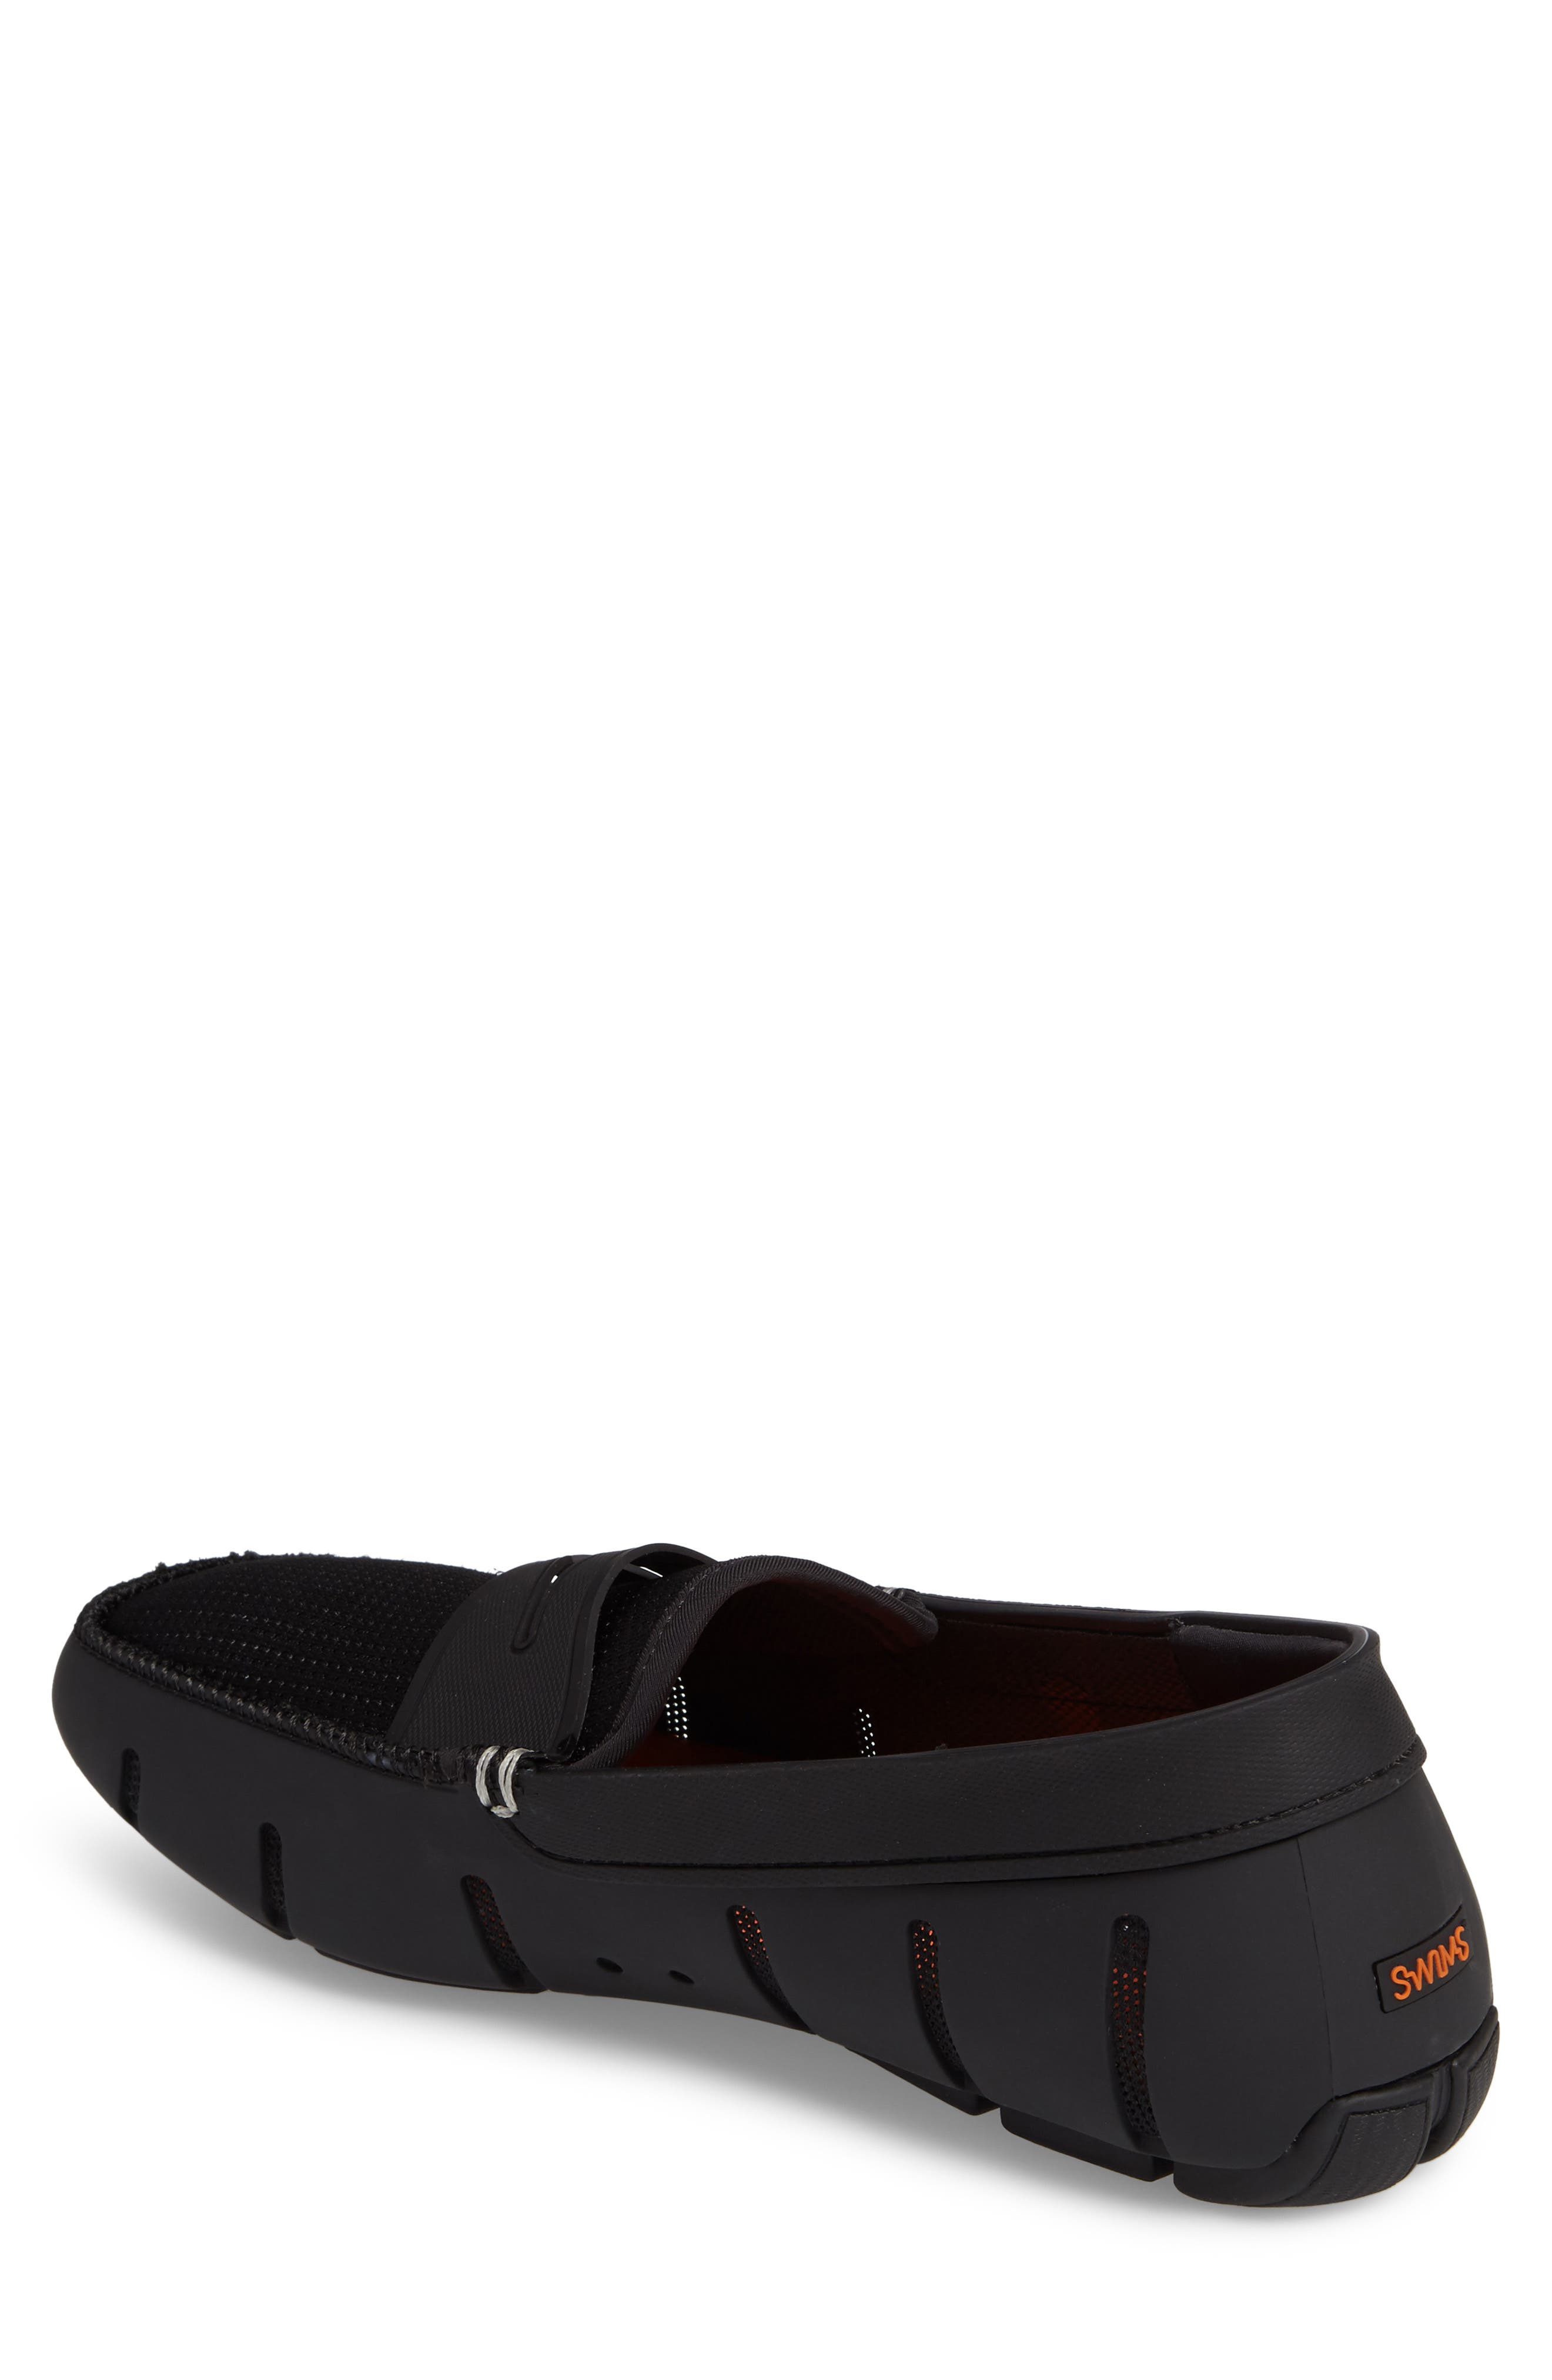 4b8cc7c3e1f Swims Shoes